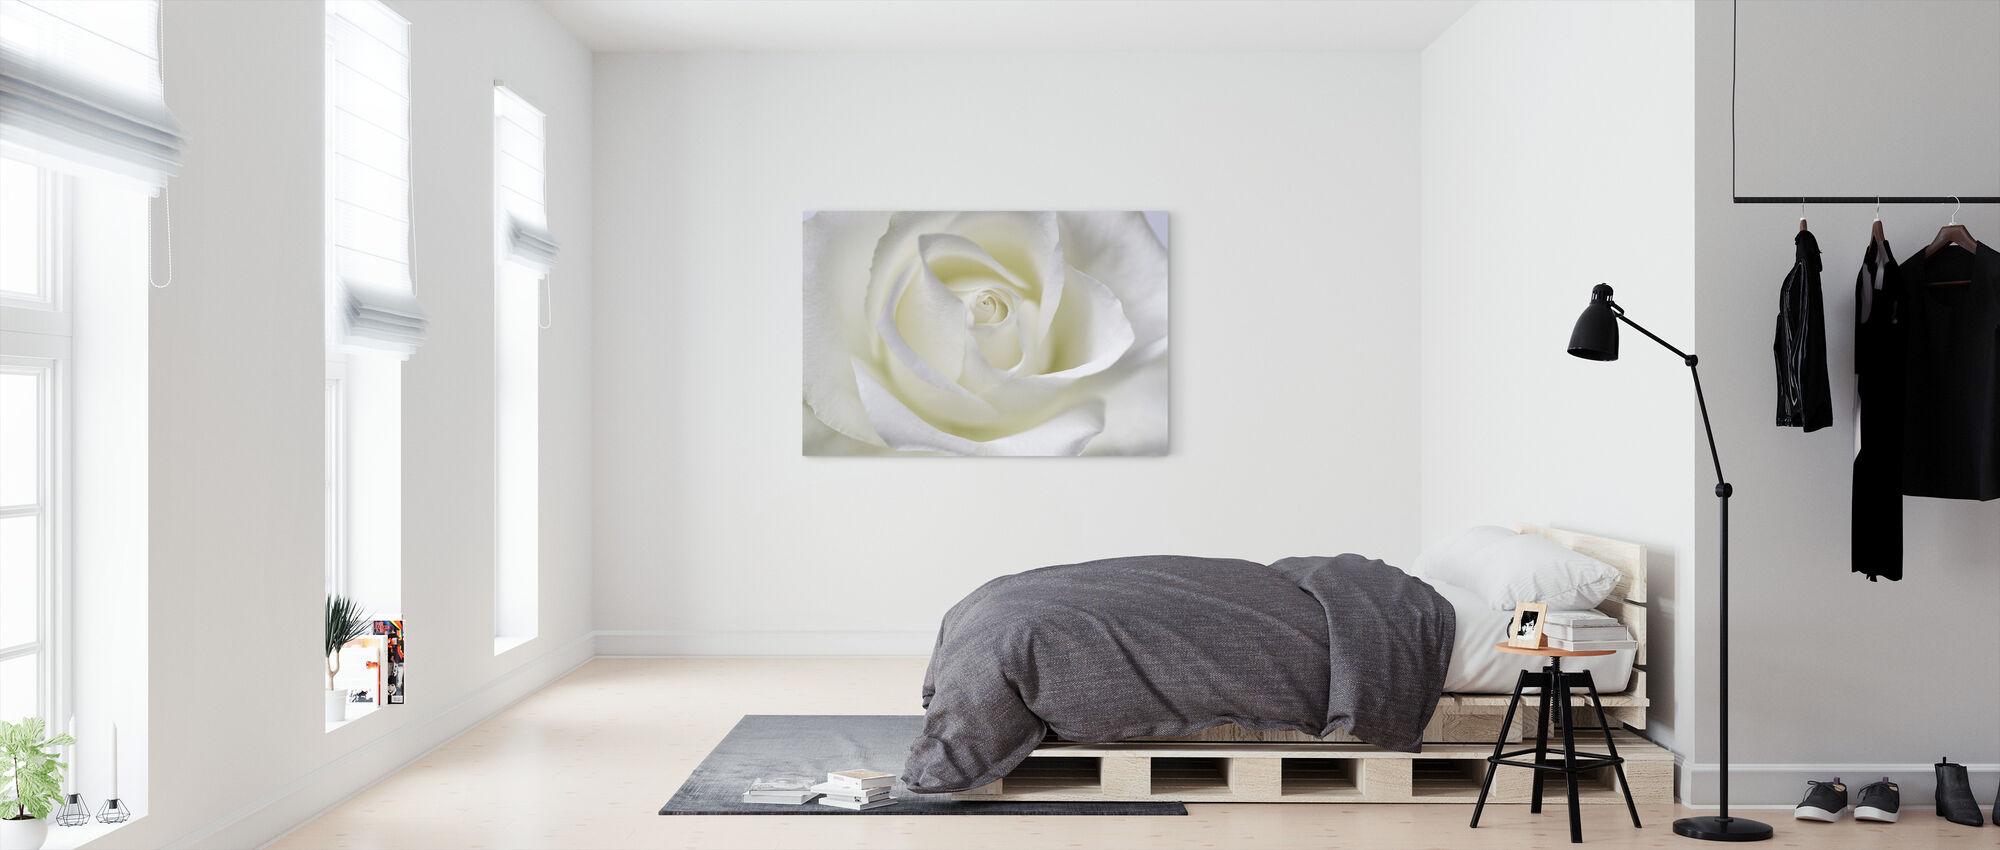 Whtie Rose - Canvas print - Bedroom